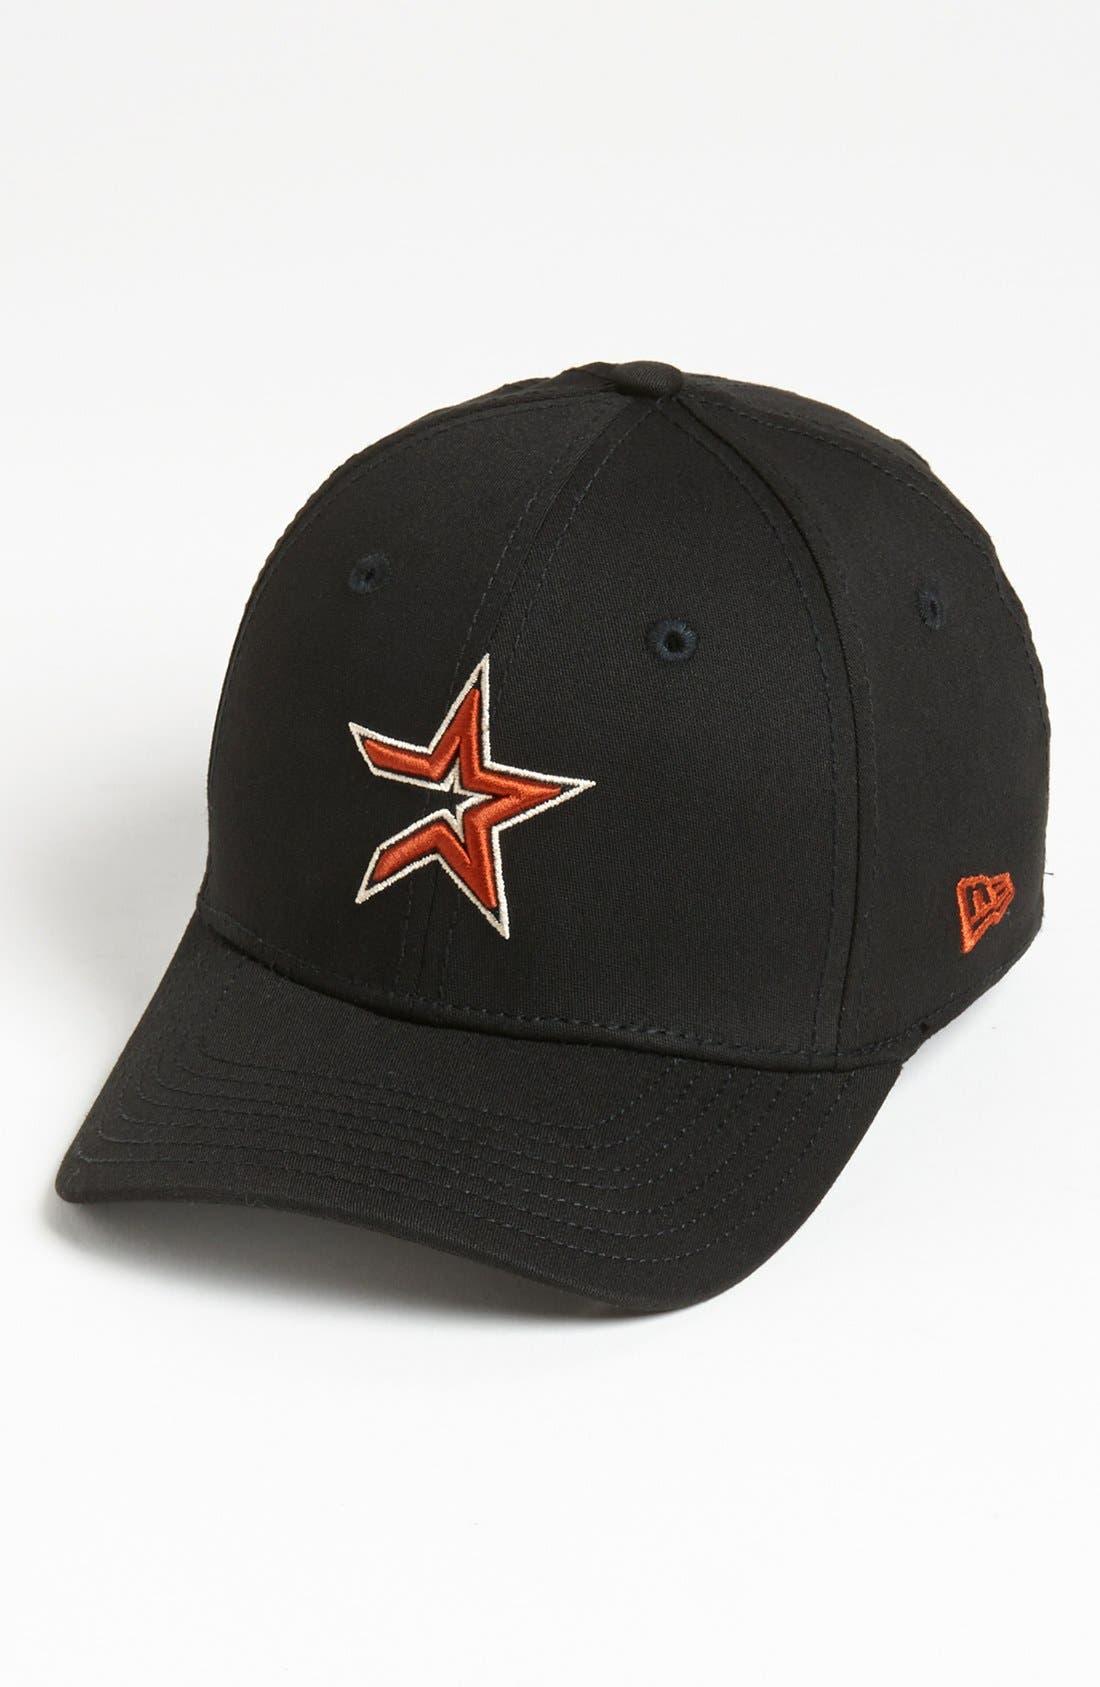 Alternate Image 1 Selected - New Era Cap 'Houston Astros - Tie Breaker' Baseball Cap (Big Boys)